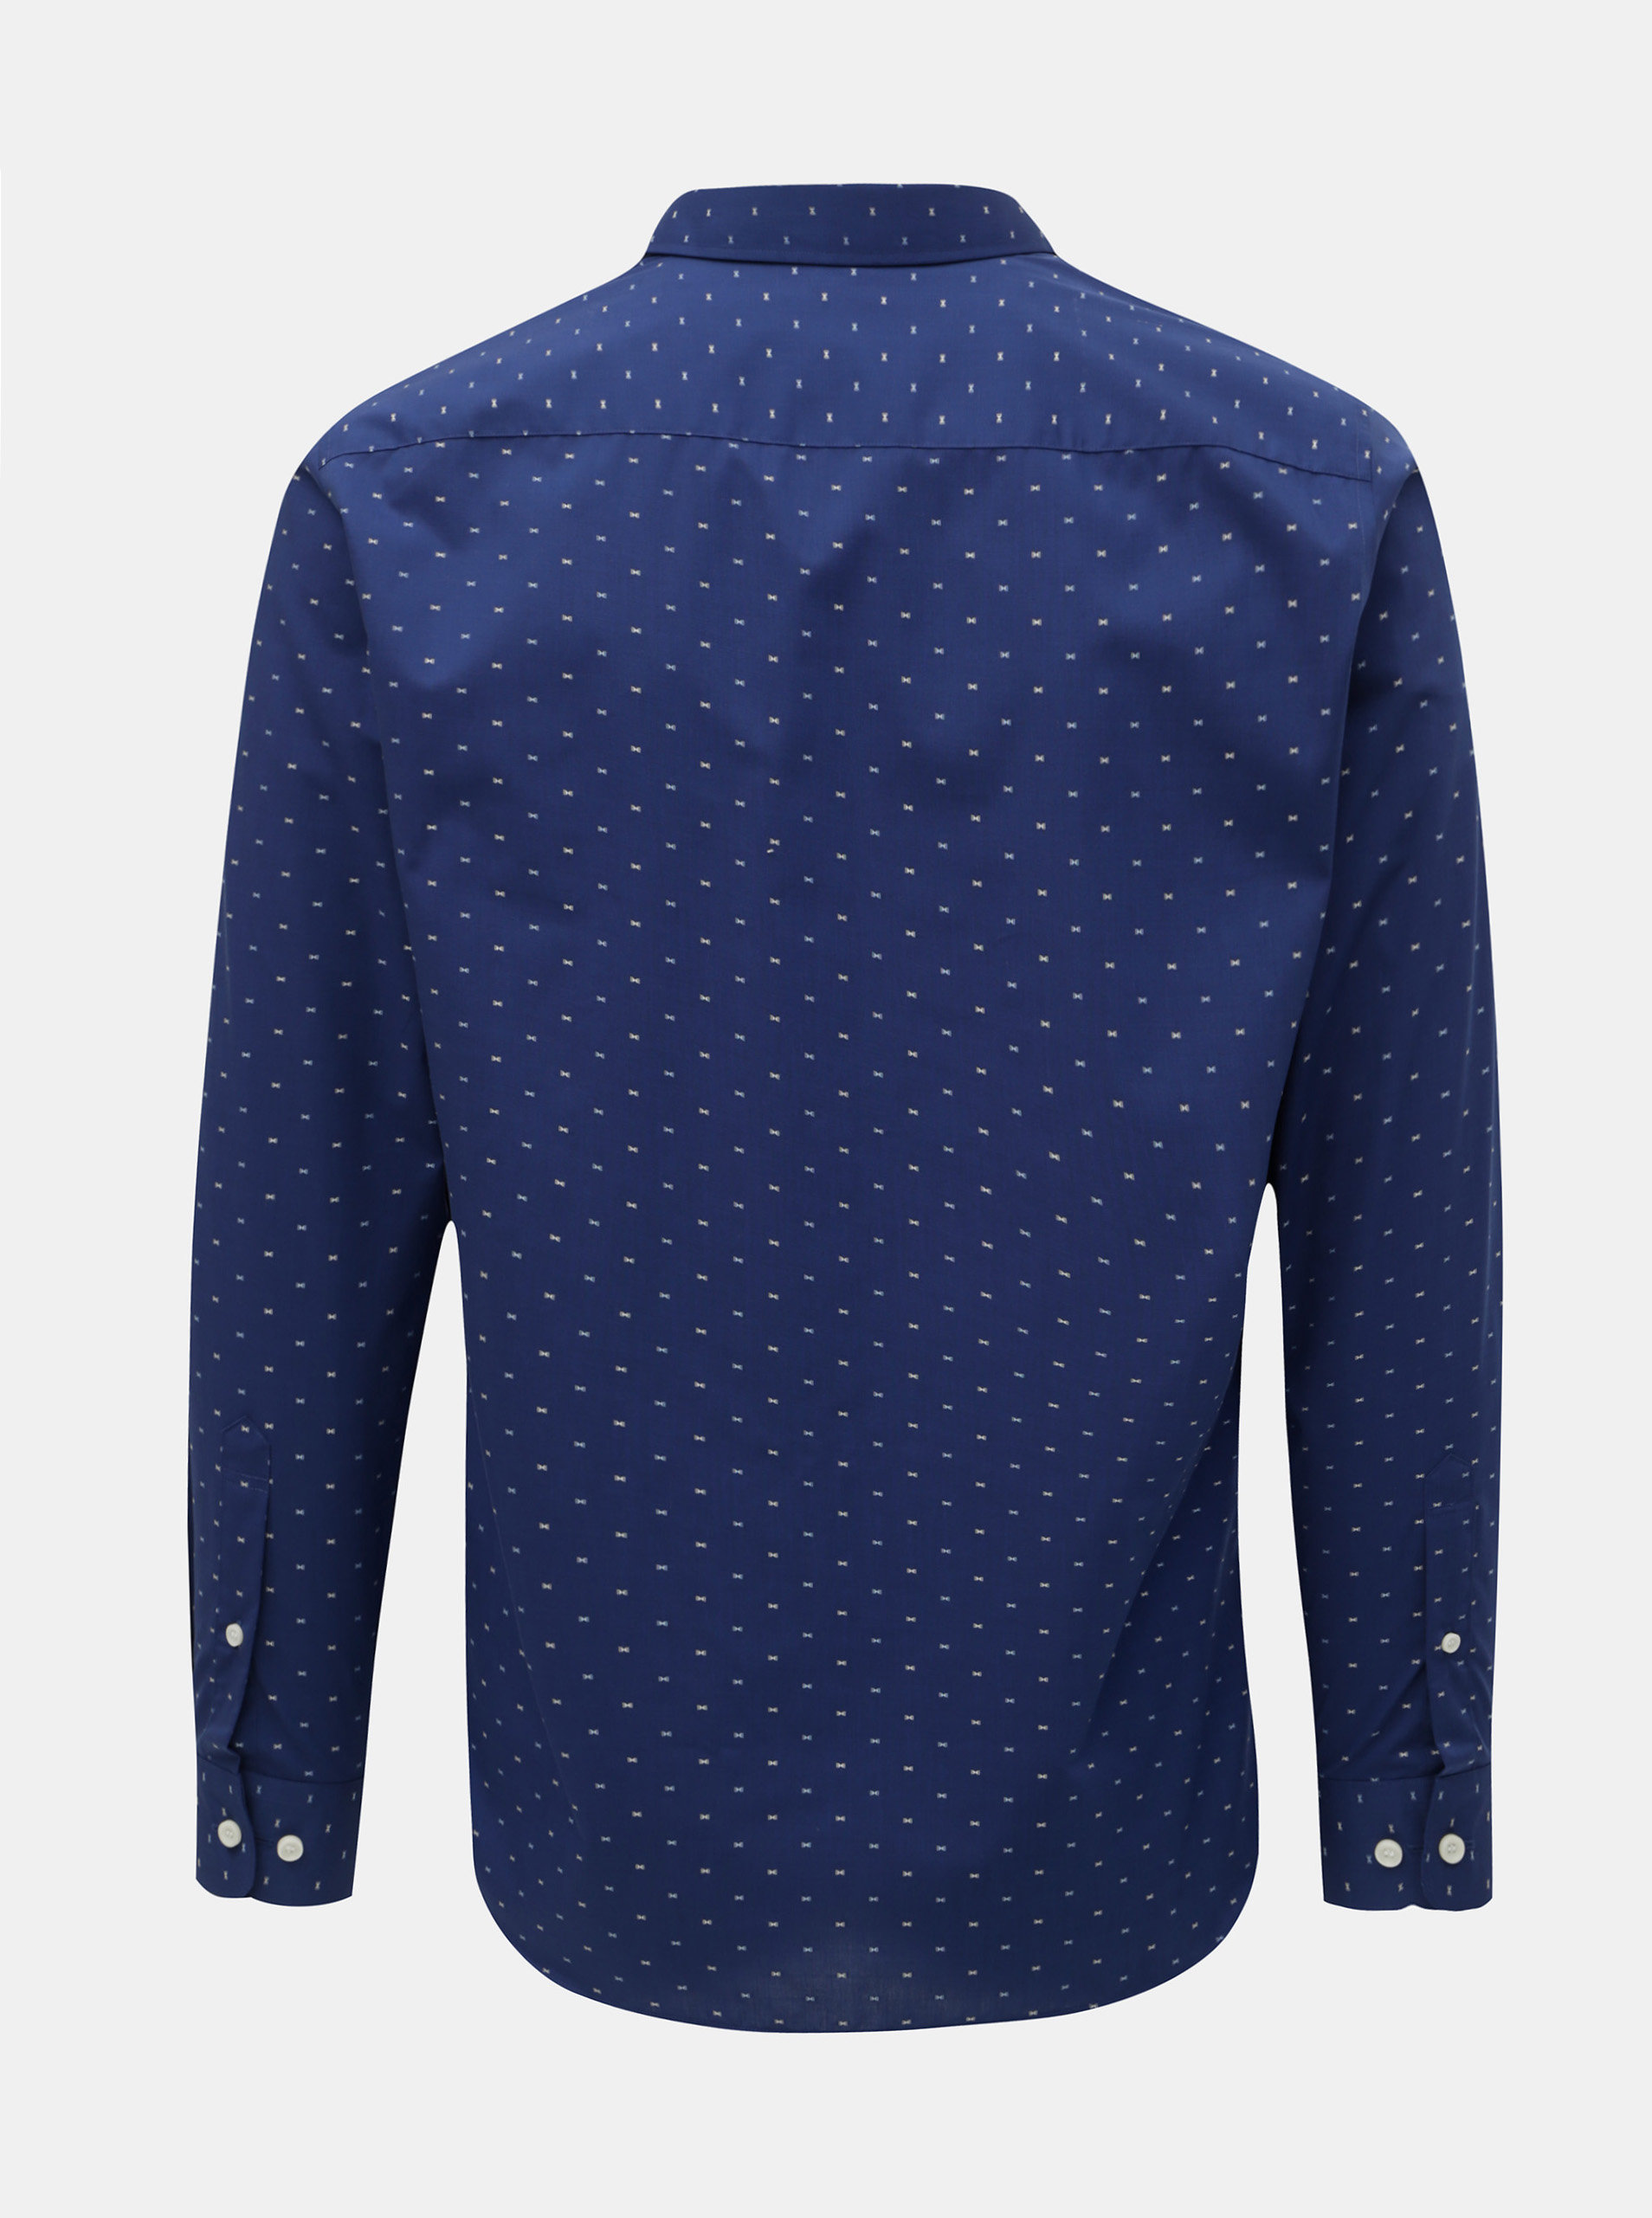 aefb9d21246d Tmavomodrá vzorovaná formálna slim fit košeľa Selected Homme Sel-Walker ...